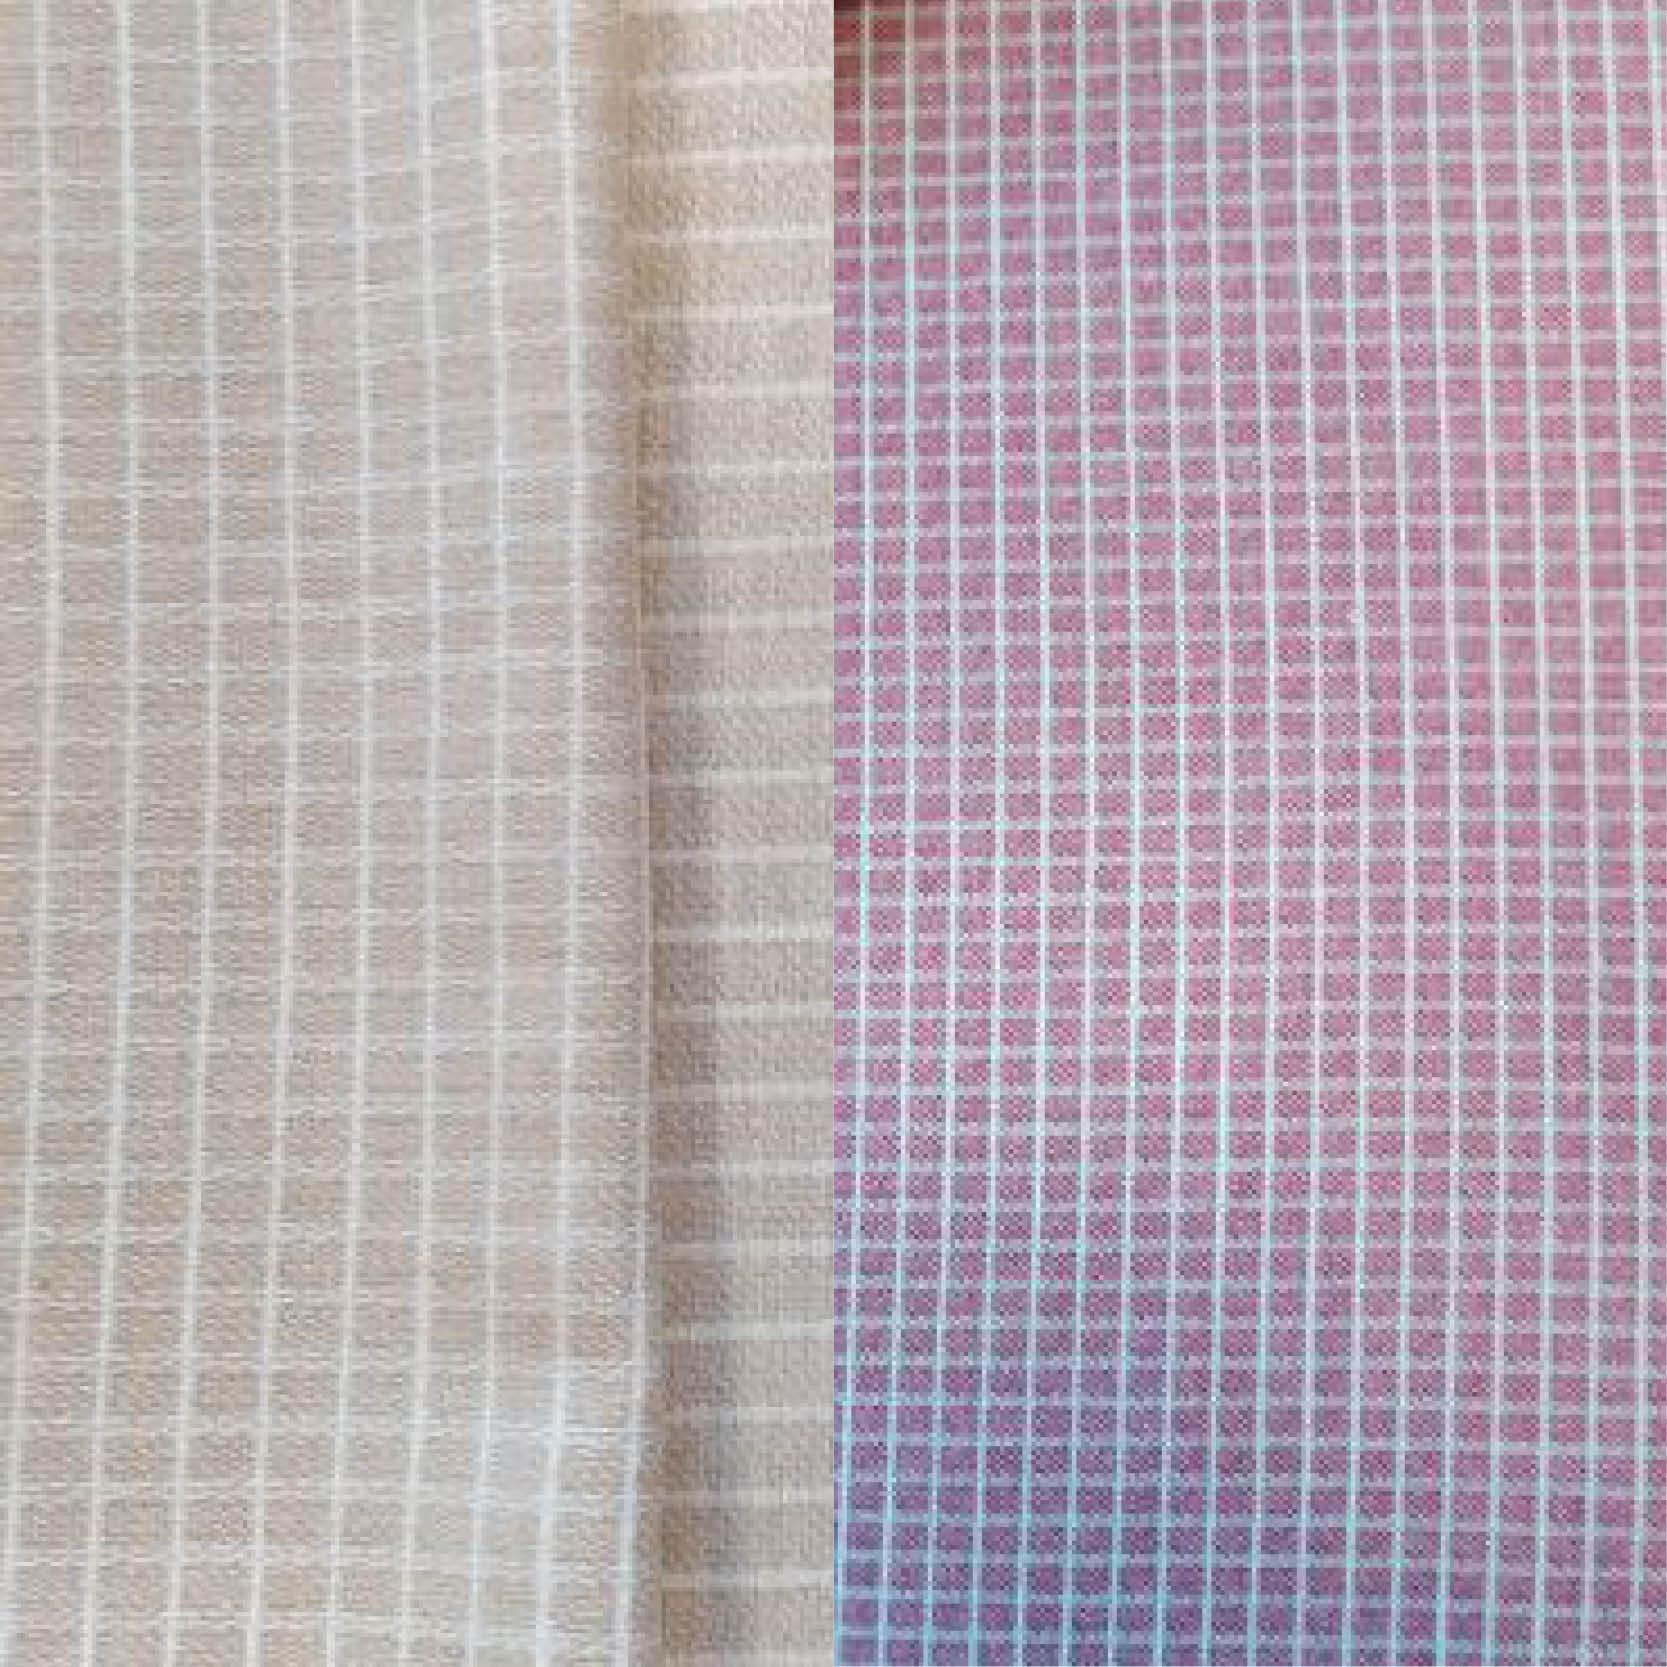 Tela chanel de lana cuadros